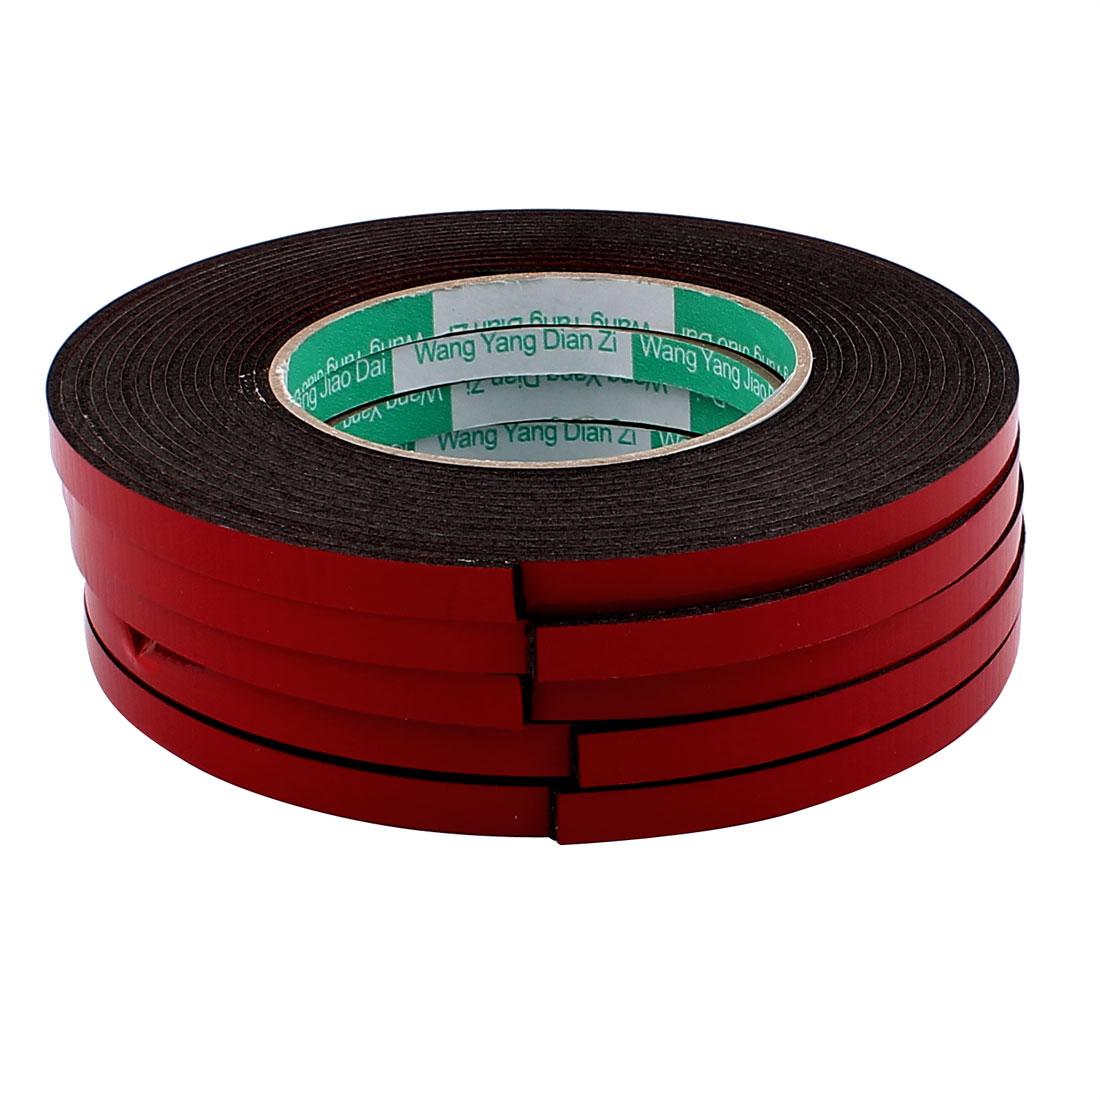 5 Pcs 8mmx2mm Double Sided Sponge Tape Adhesive Sticker Foam Glue Strip Sealing 5 Meters